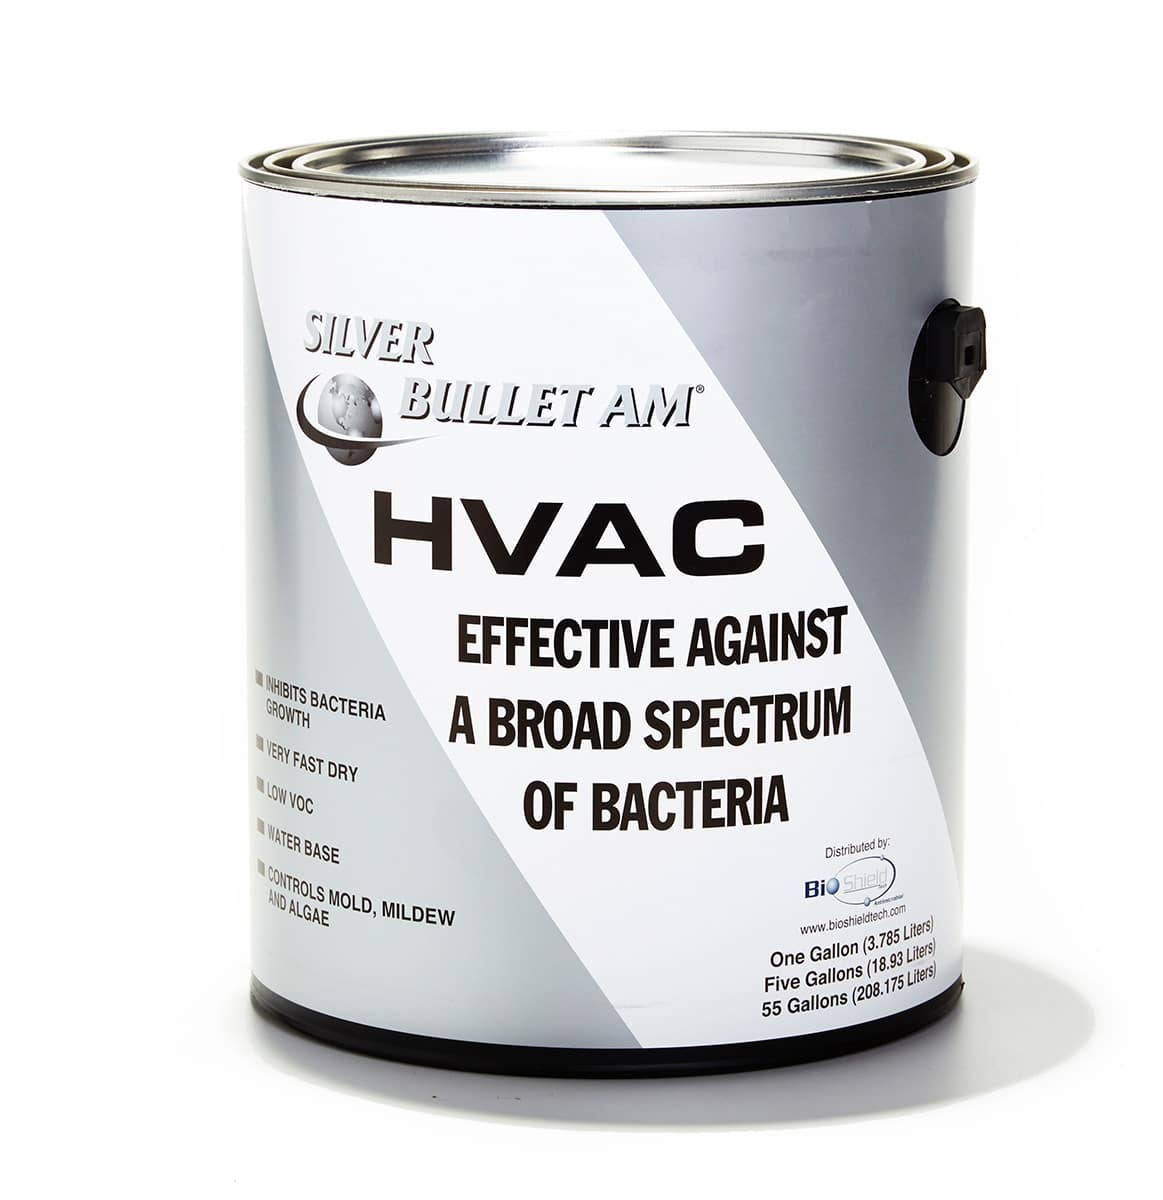 Silver Bullet AM™